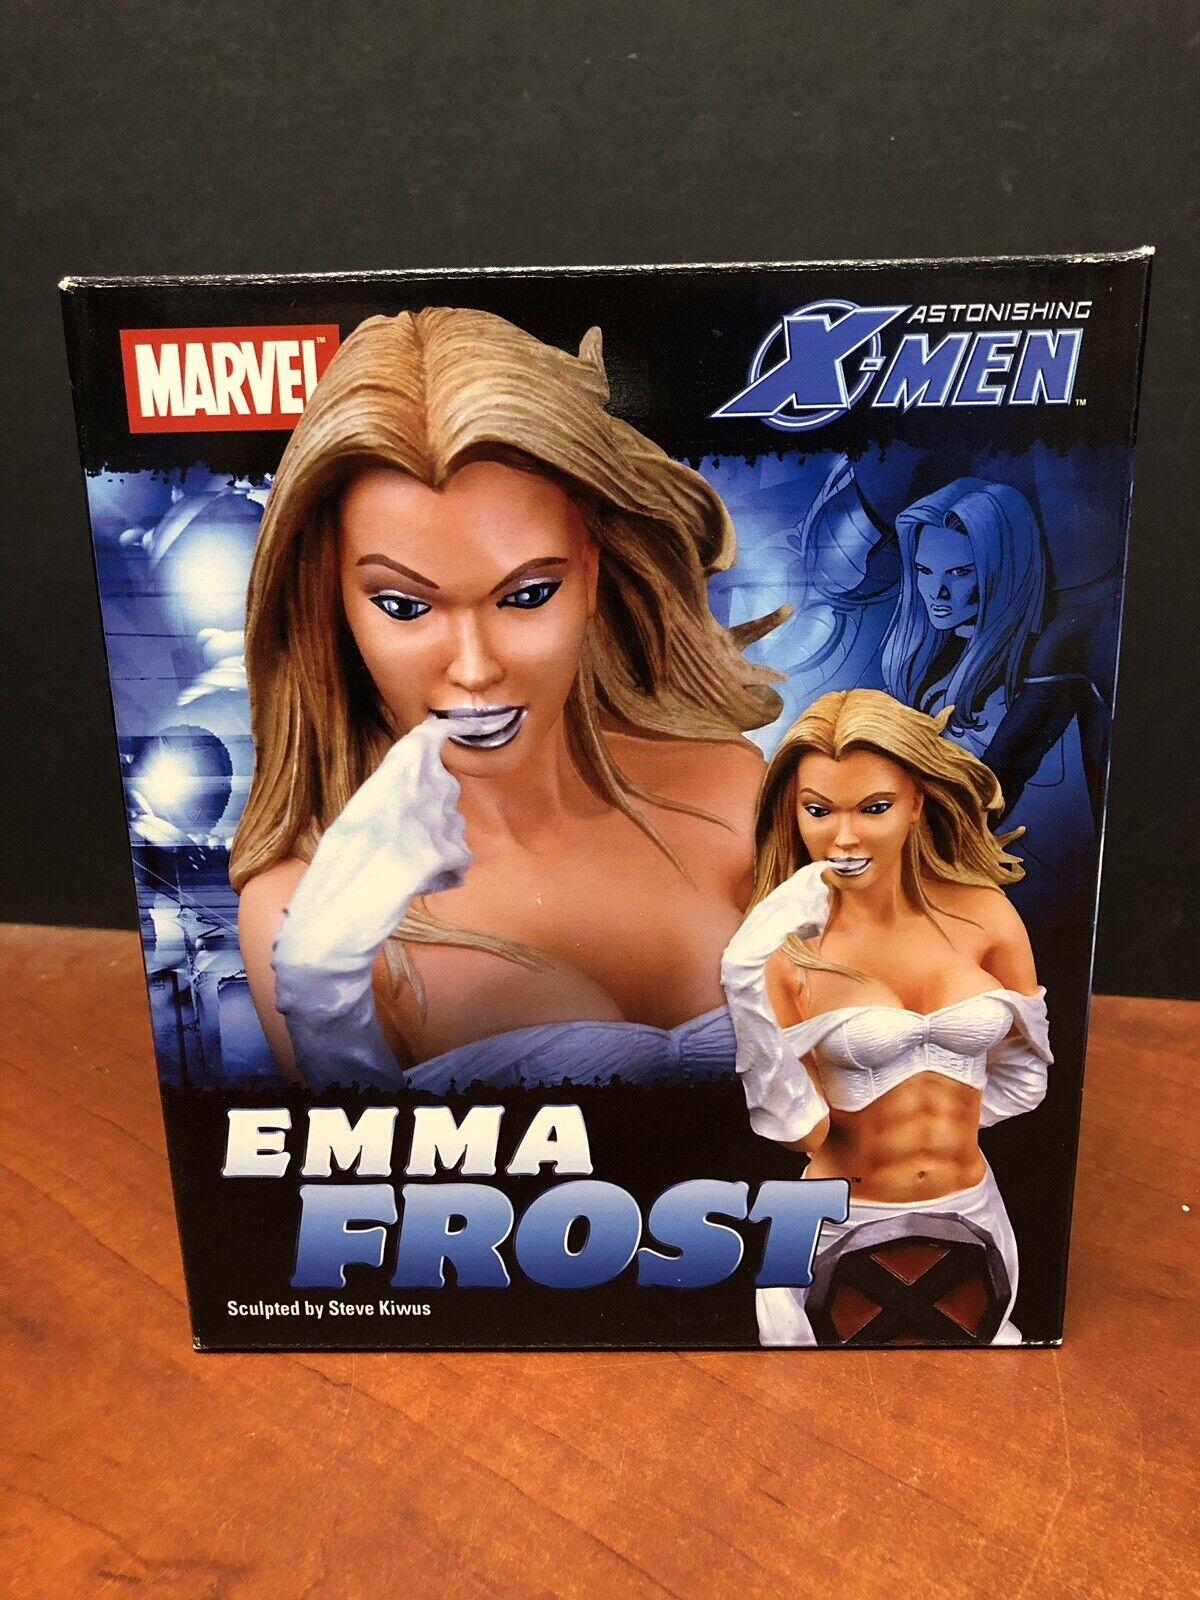 Diamond seleccionar Marvel X-men Emma Frost Busto Tamp 0194